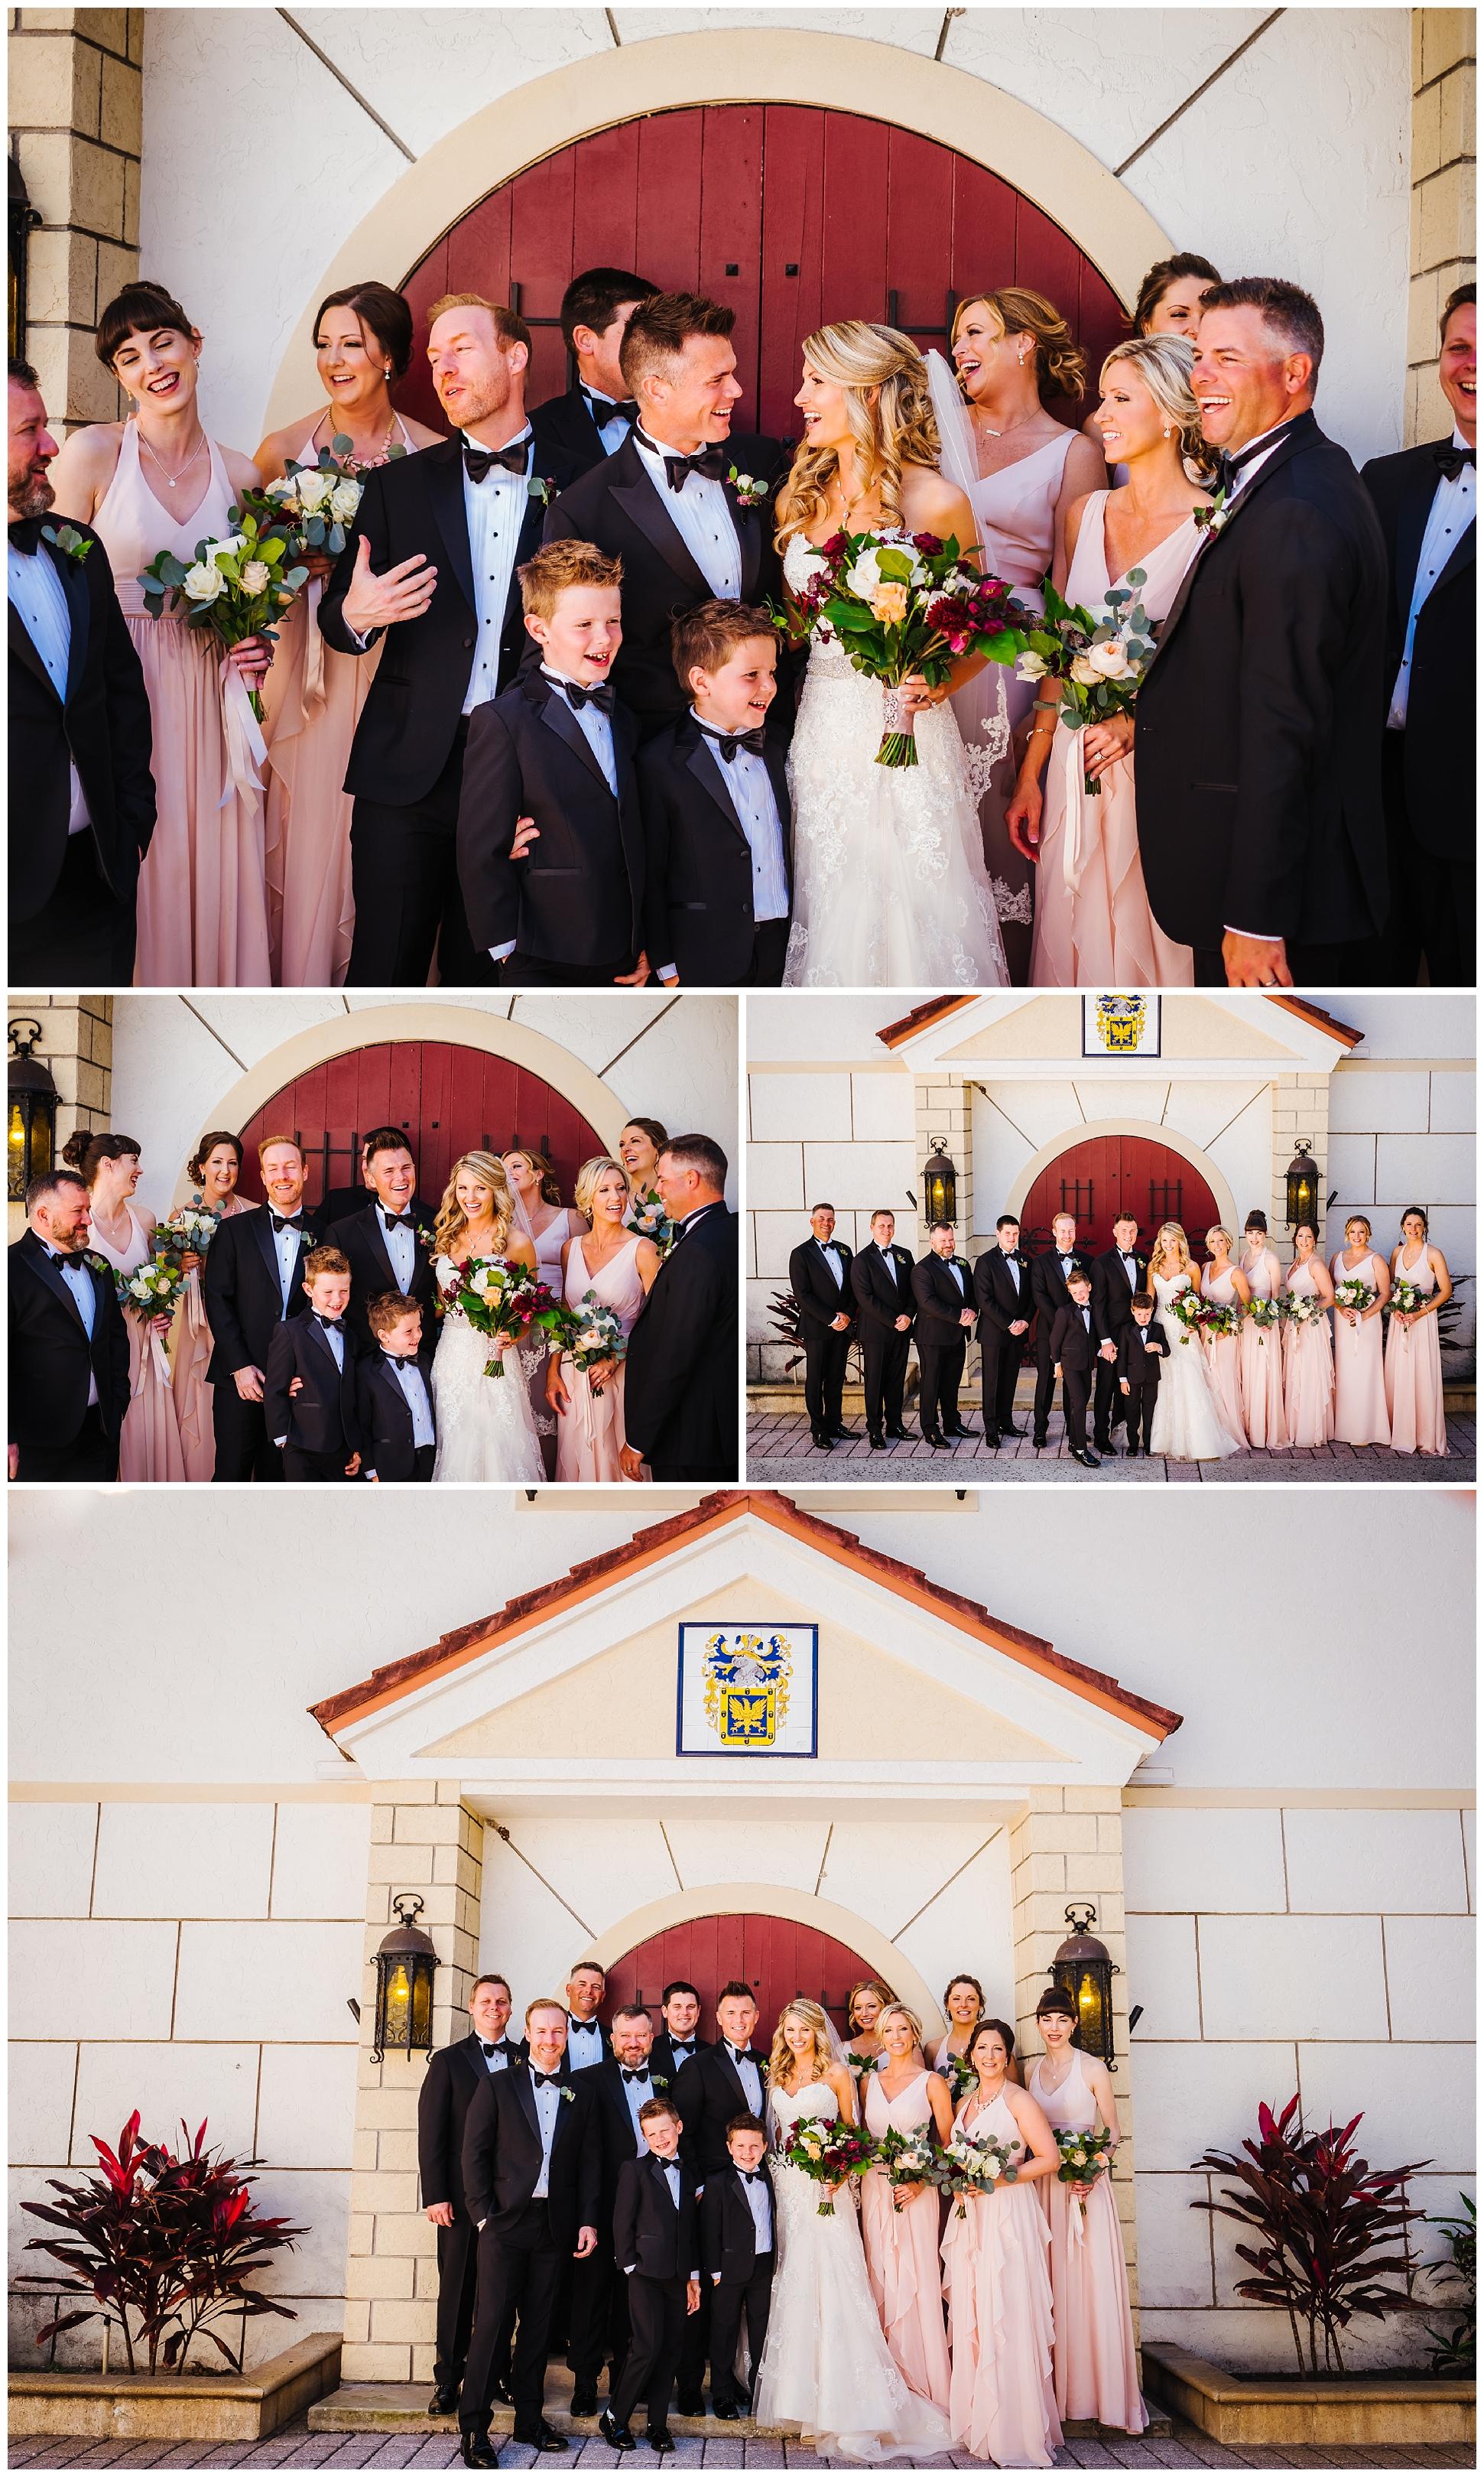 tampa-bradenton-wedding-photographer-south-florida-museum-classic-blush-gold-alpacas-sparklers_0028.jpg